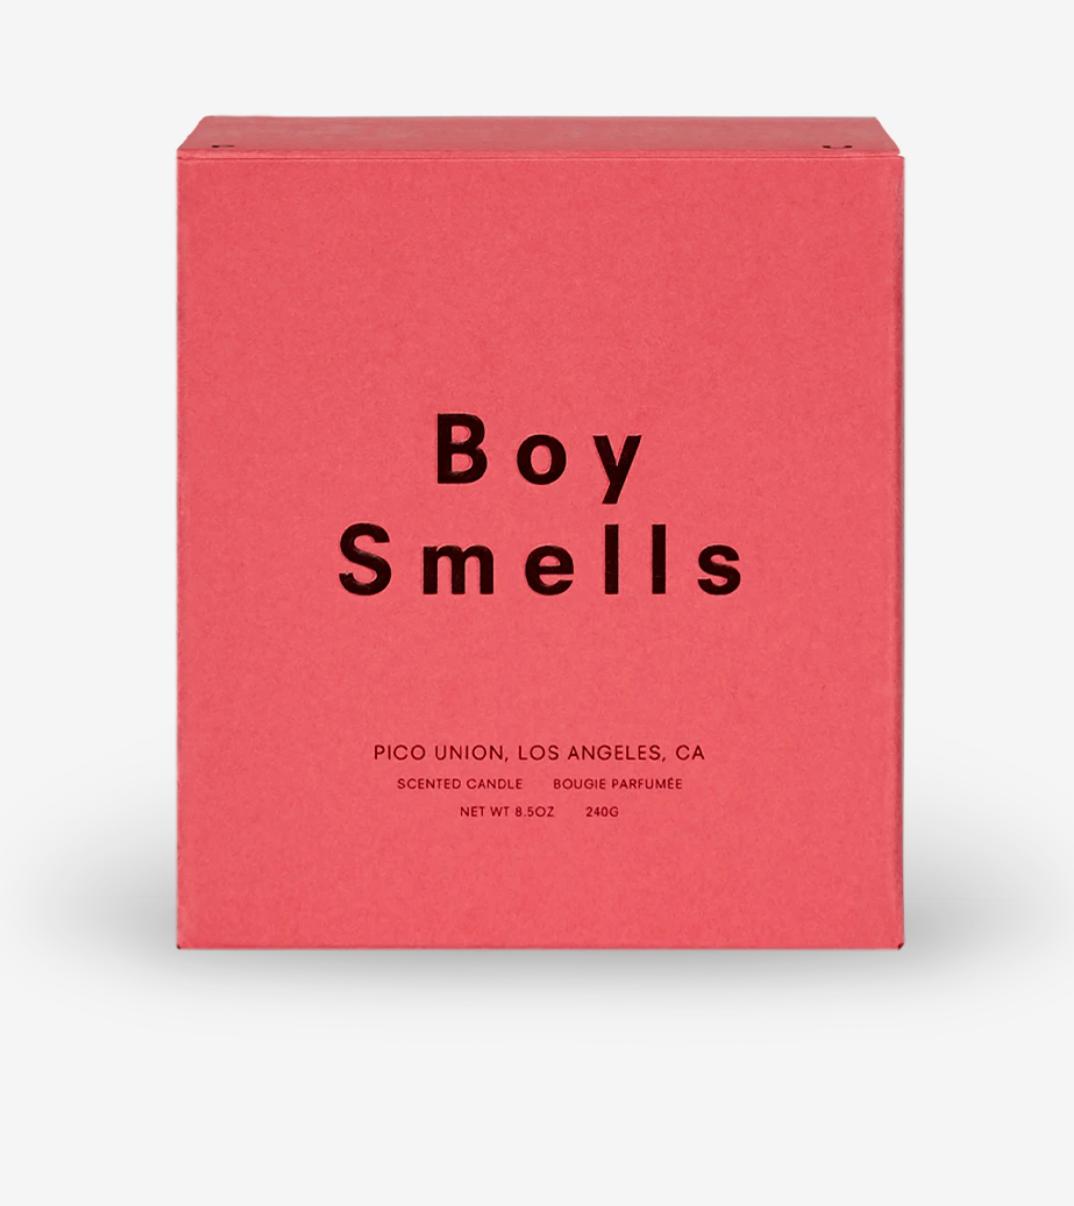 Boy Smells PRIDE 2020 Damasque Candle Boy Smells 8.5 oz Candle